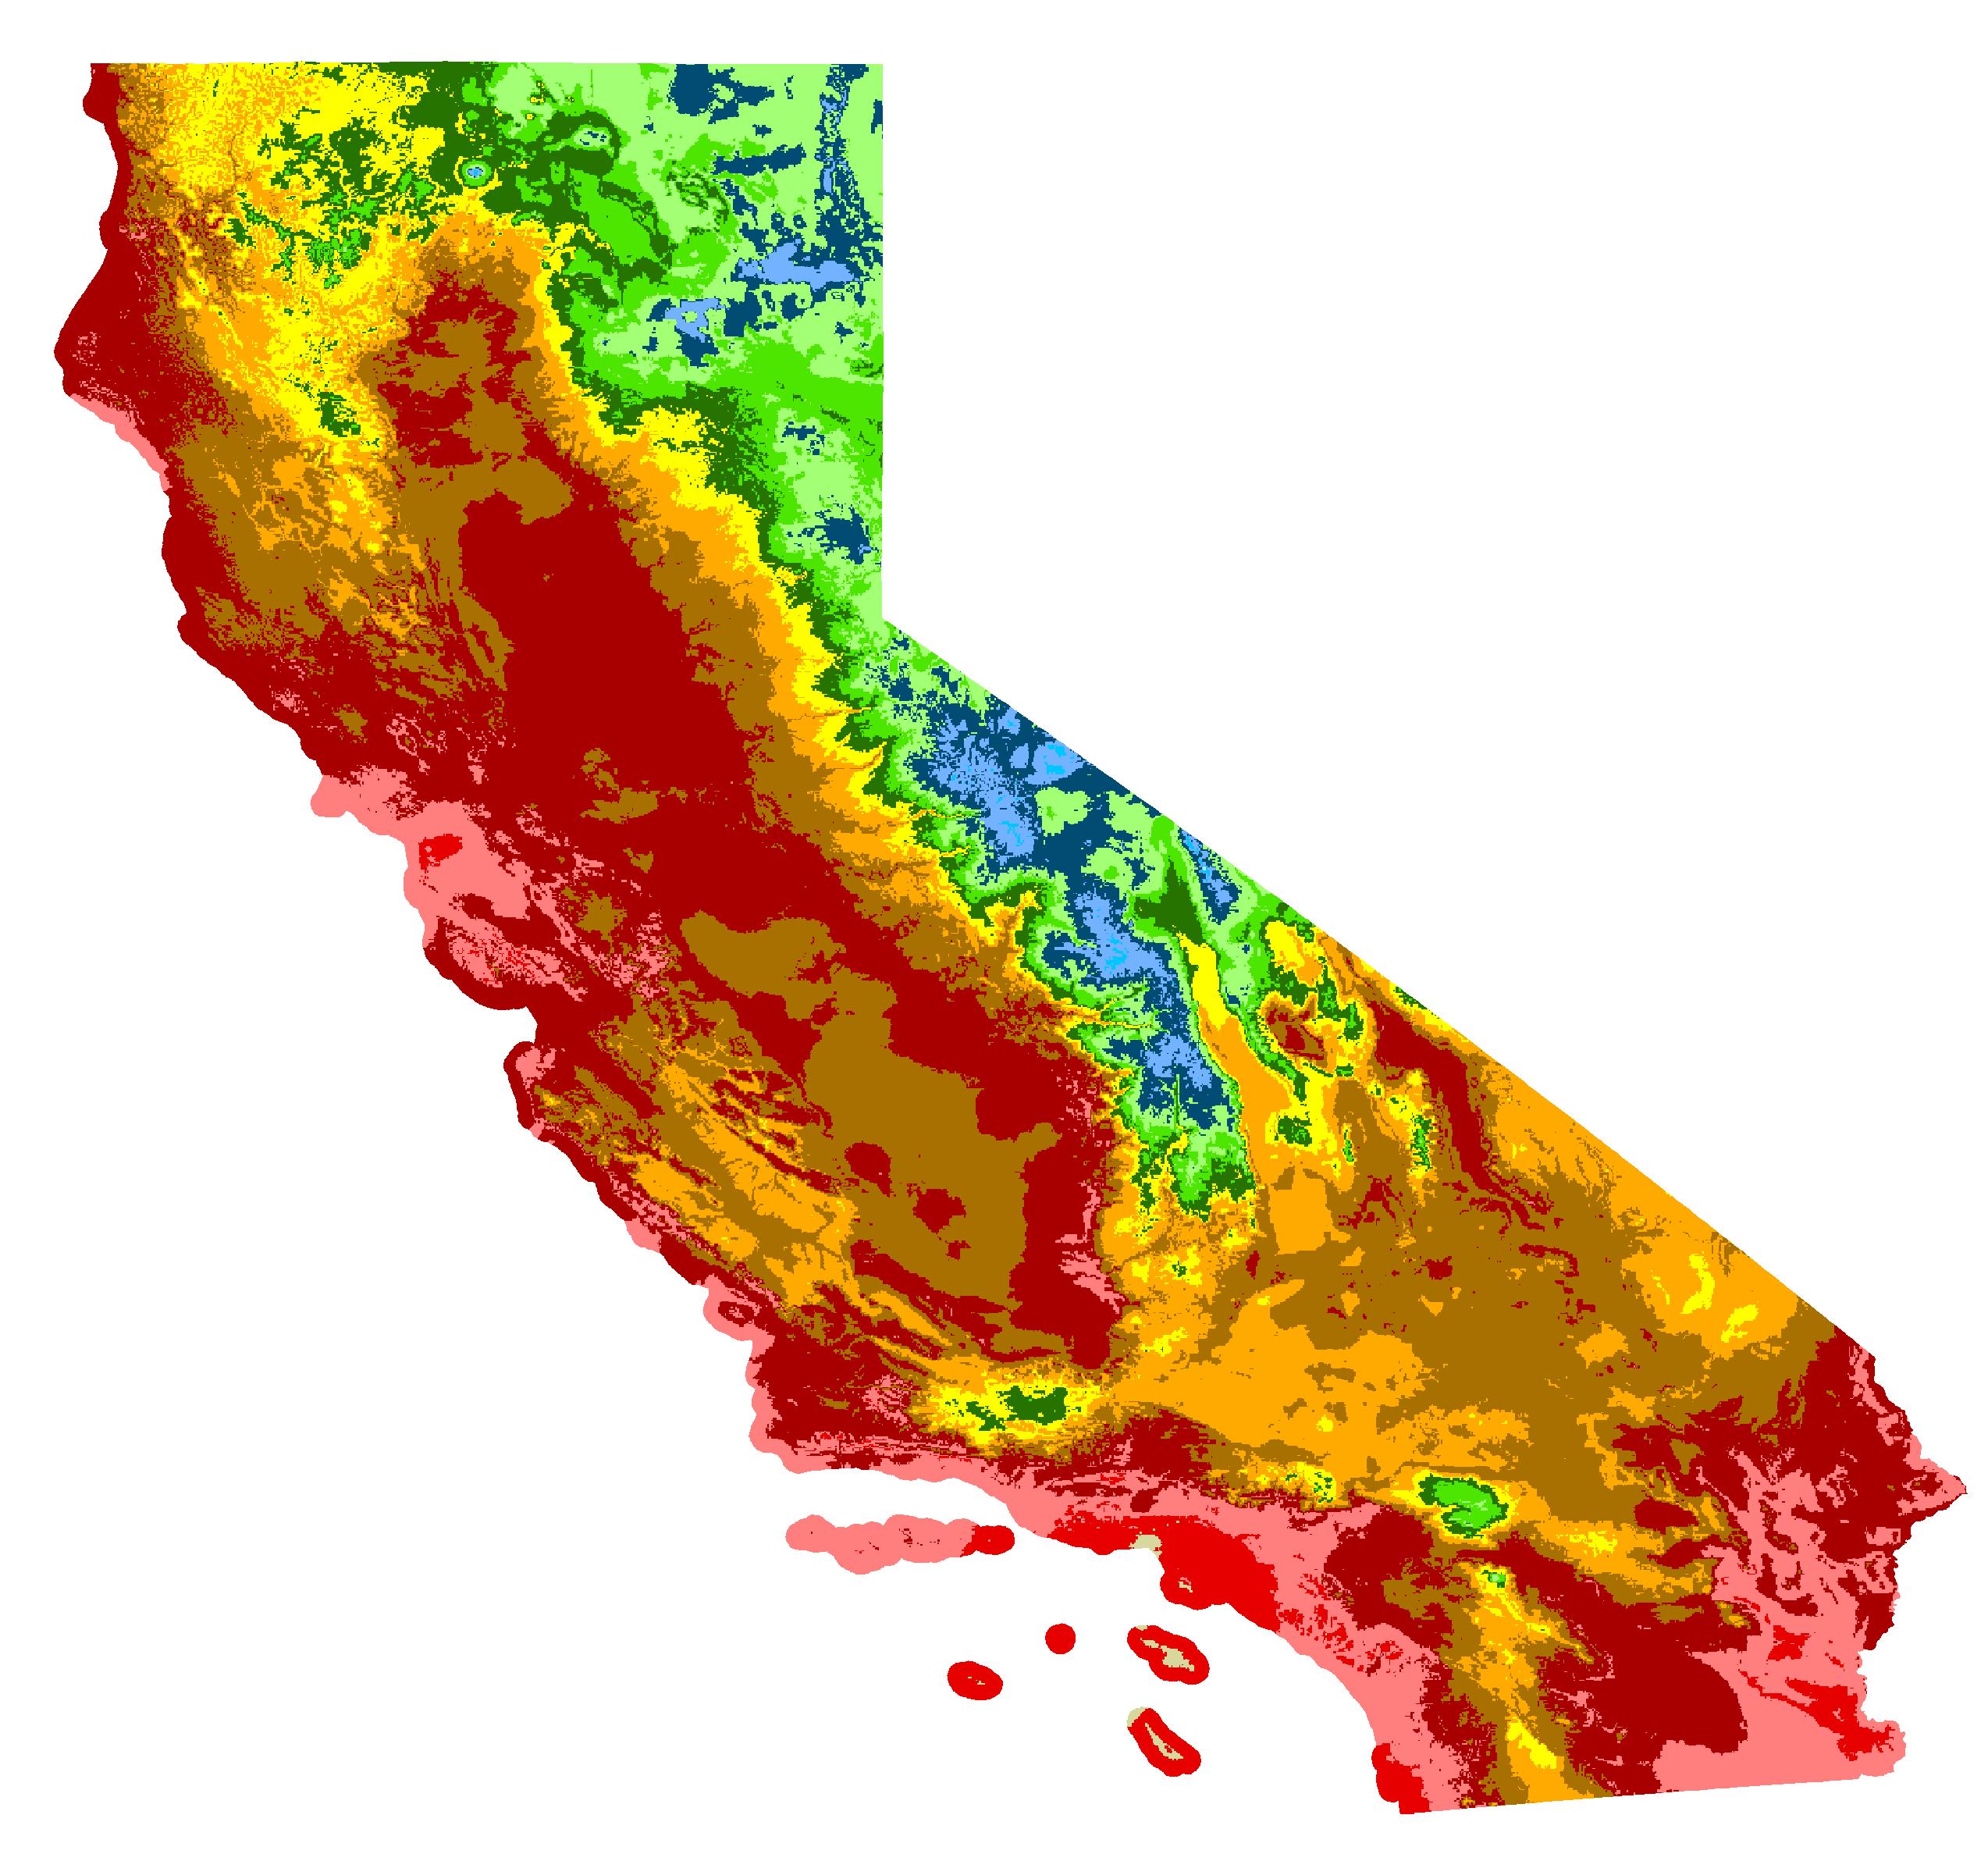 Mendocino County, California Hardiness Zones